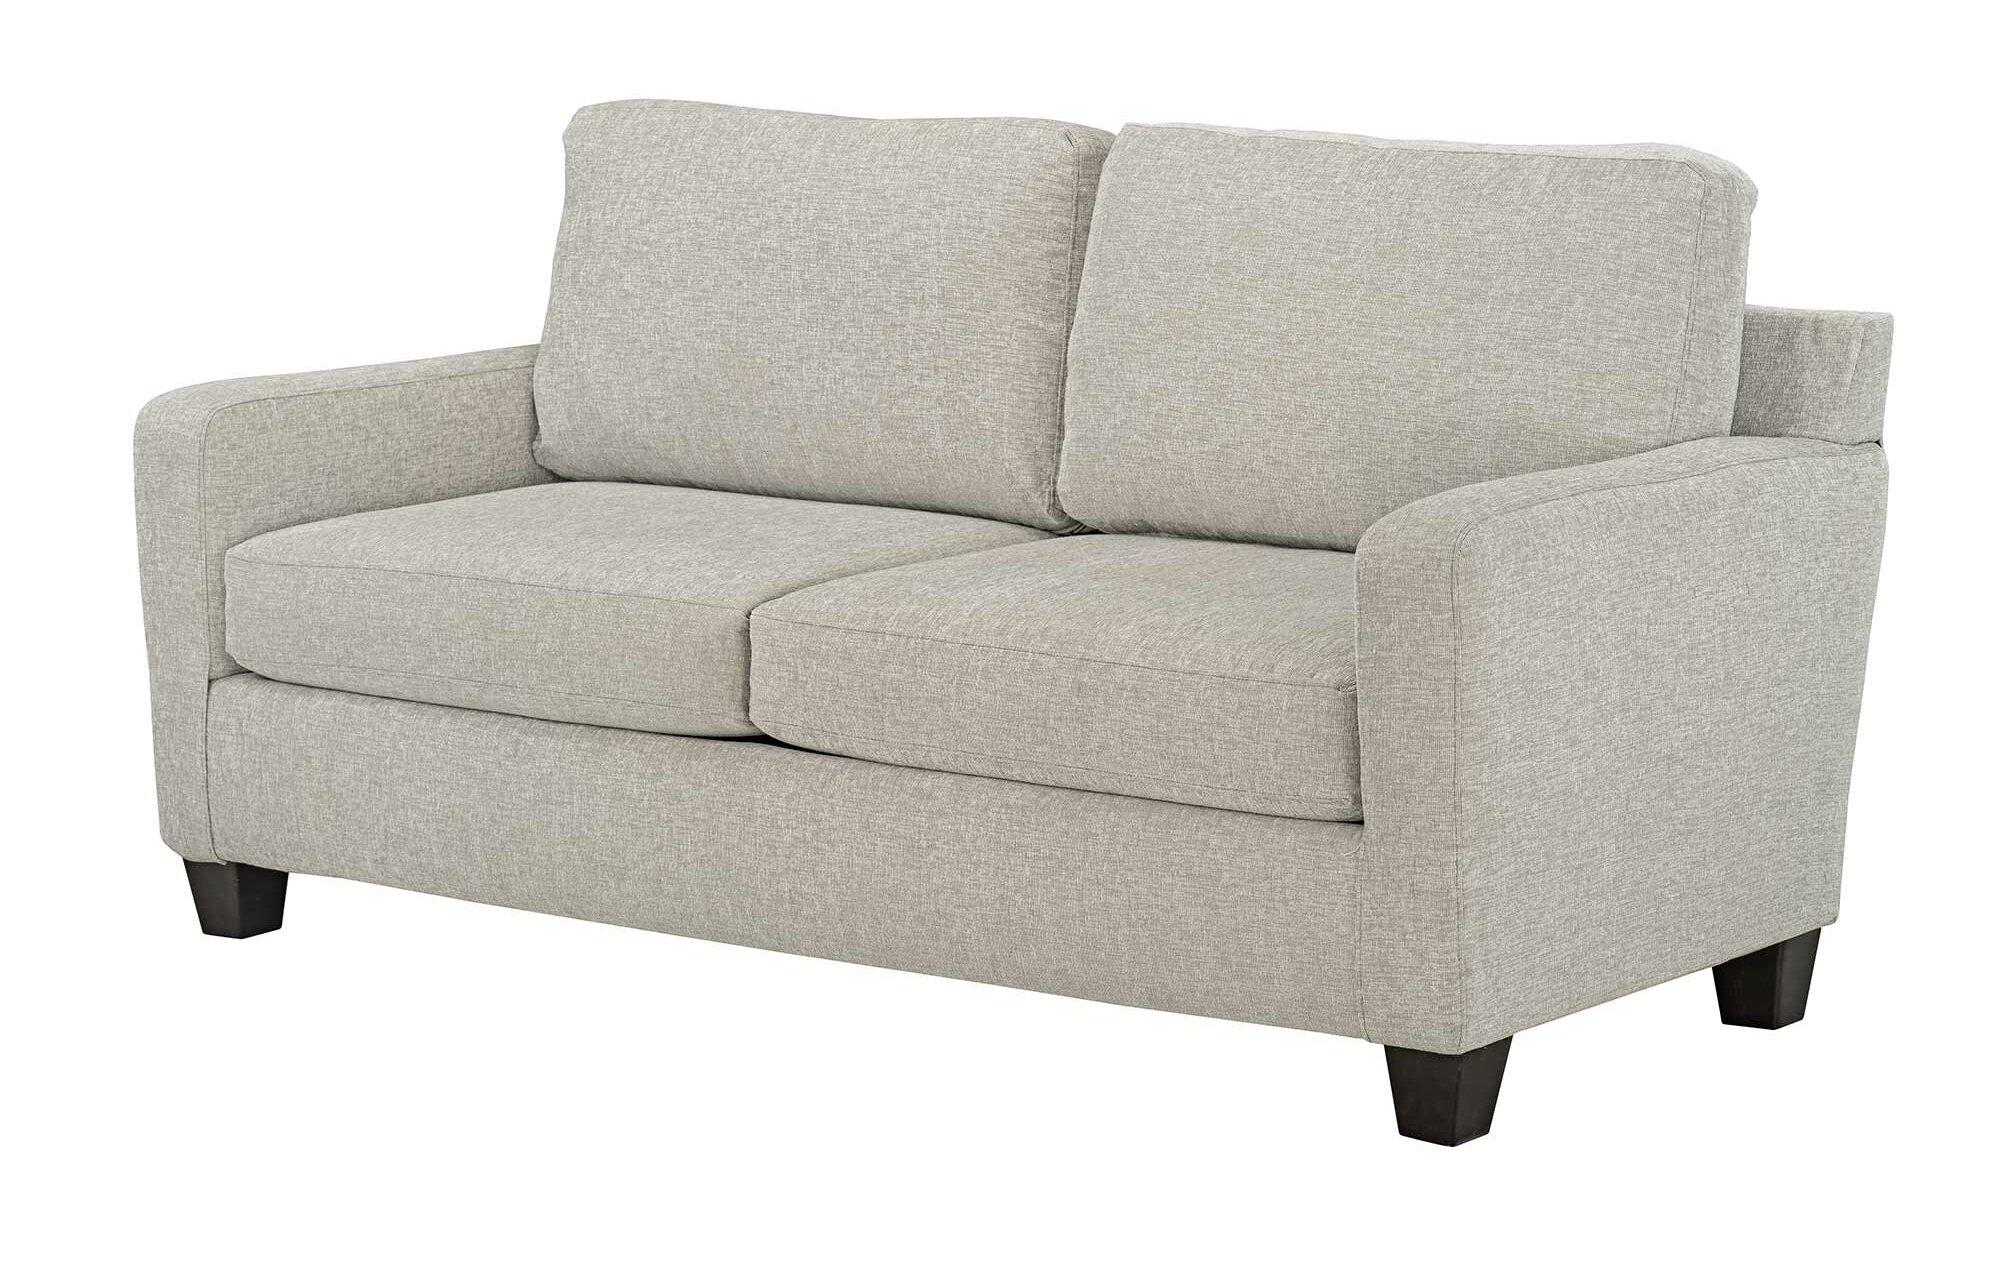 Grimsley 2 Seat Sofa